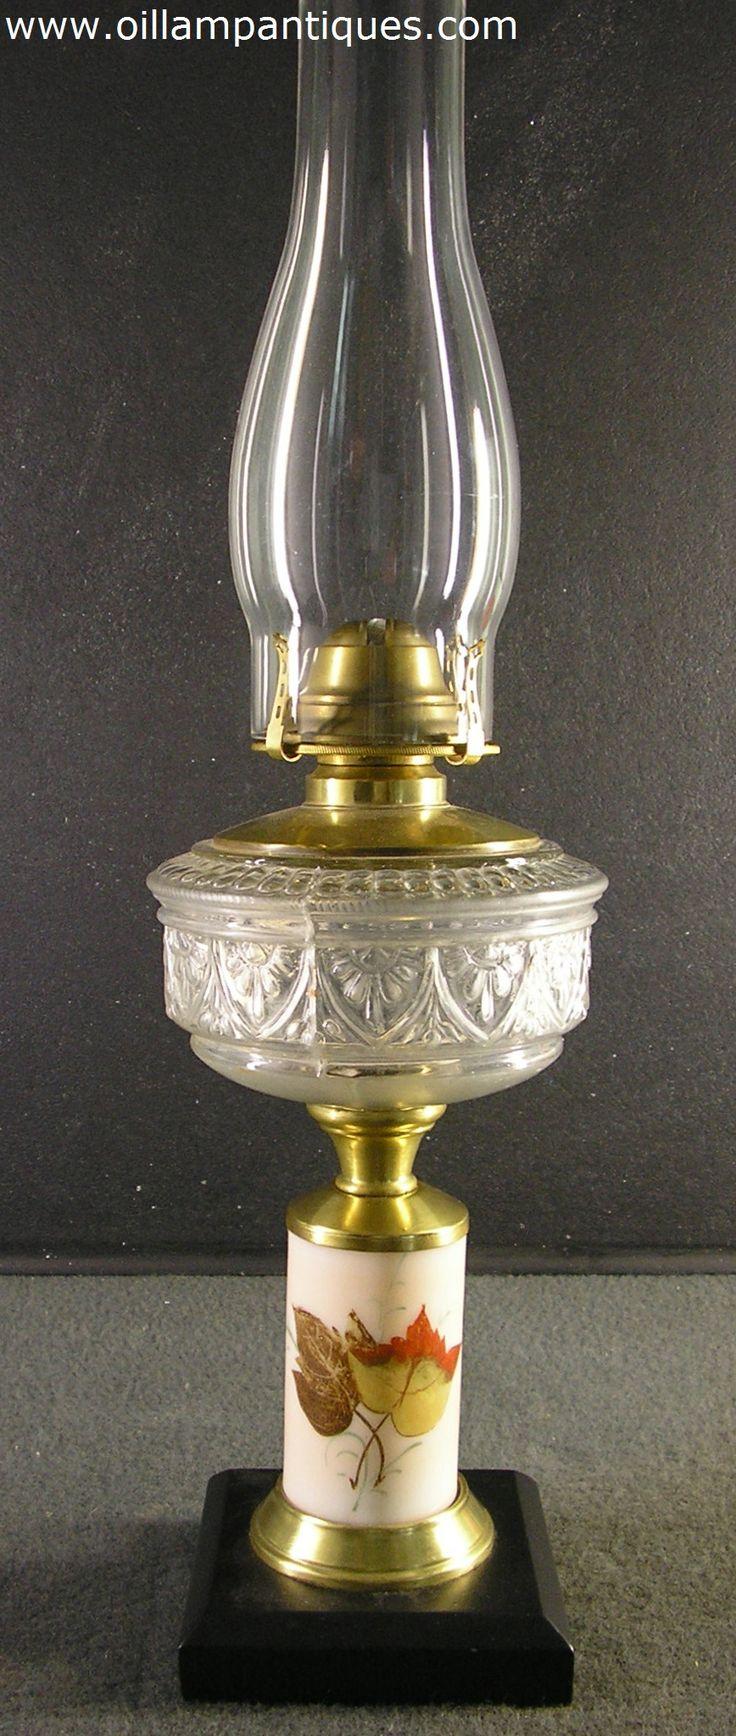 233 best images about vintage oil lamps on Pinterest ...